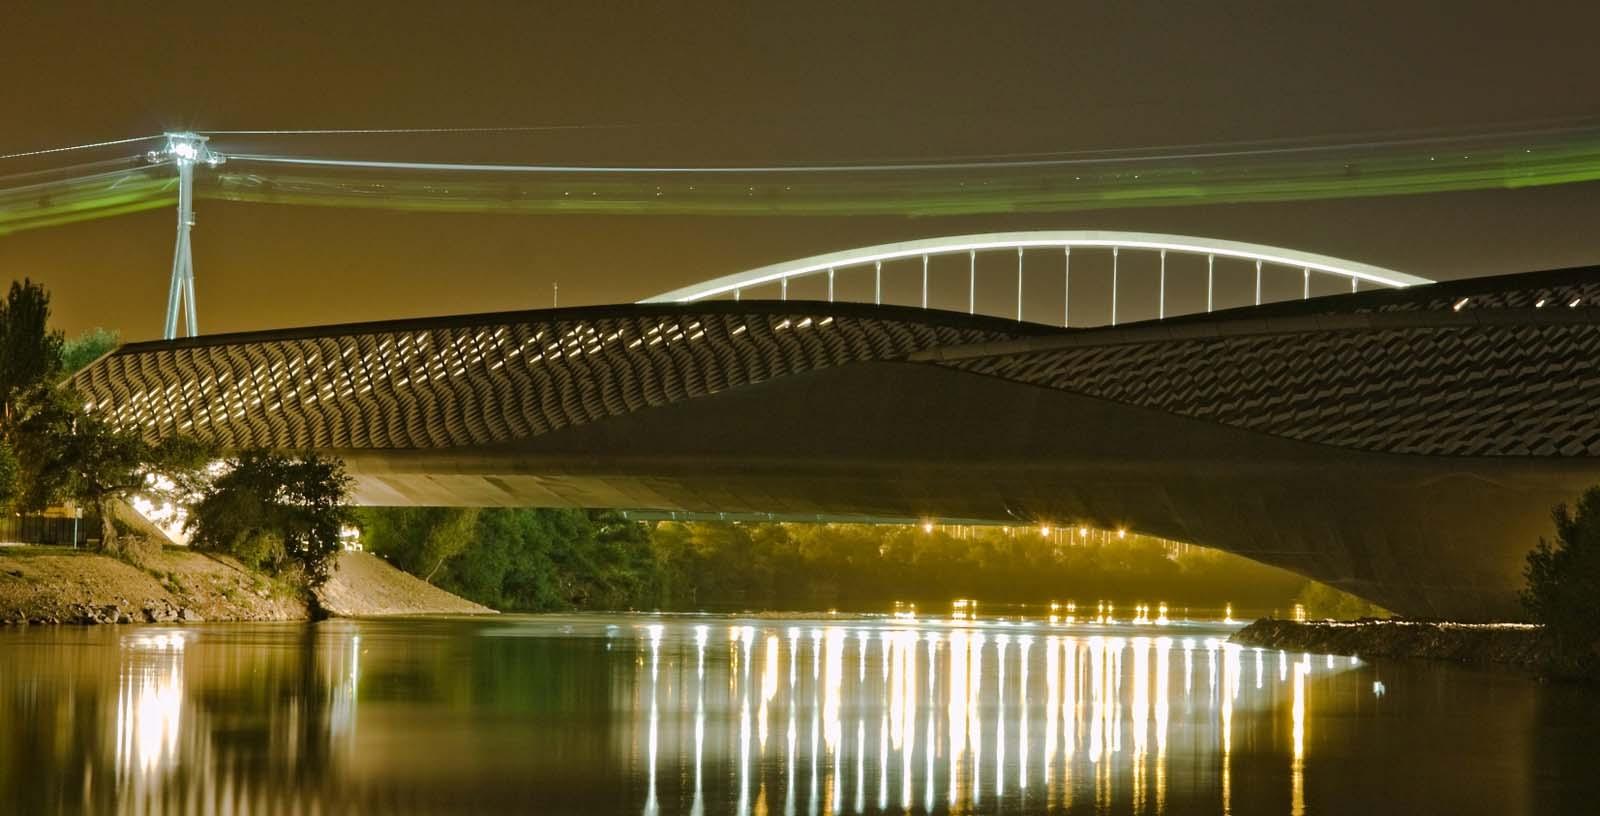 Zaha_Hadid_Bridge_Expo_Zaragoza_01_Building_Idom__Antonio_Ramos_-_www.photaki.es